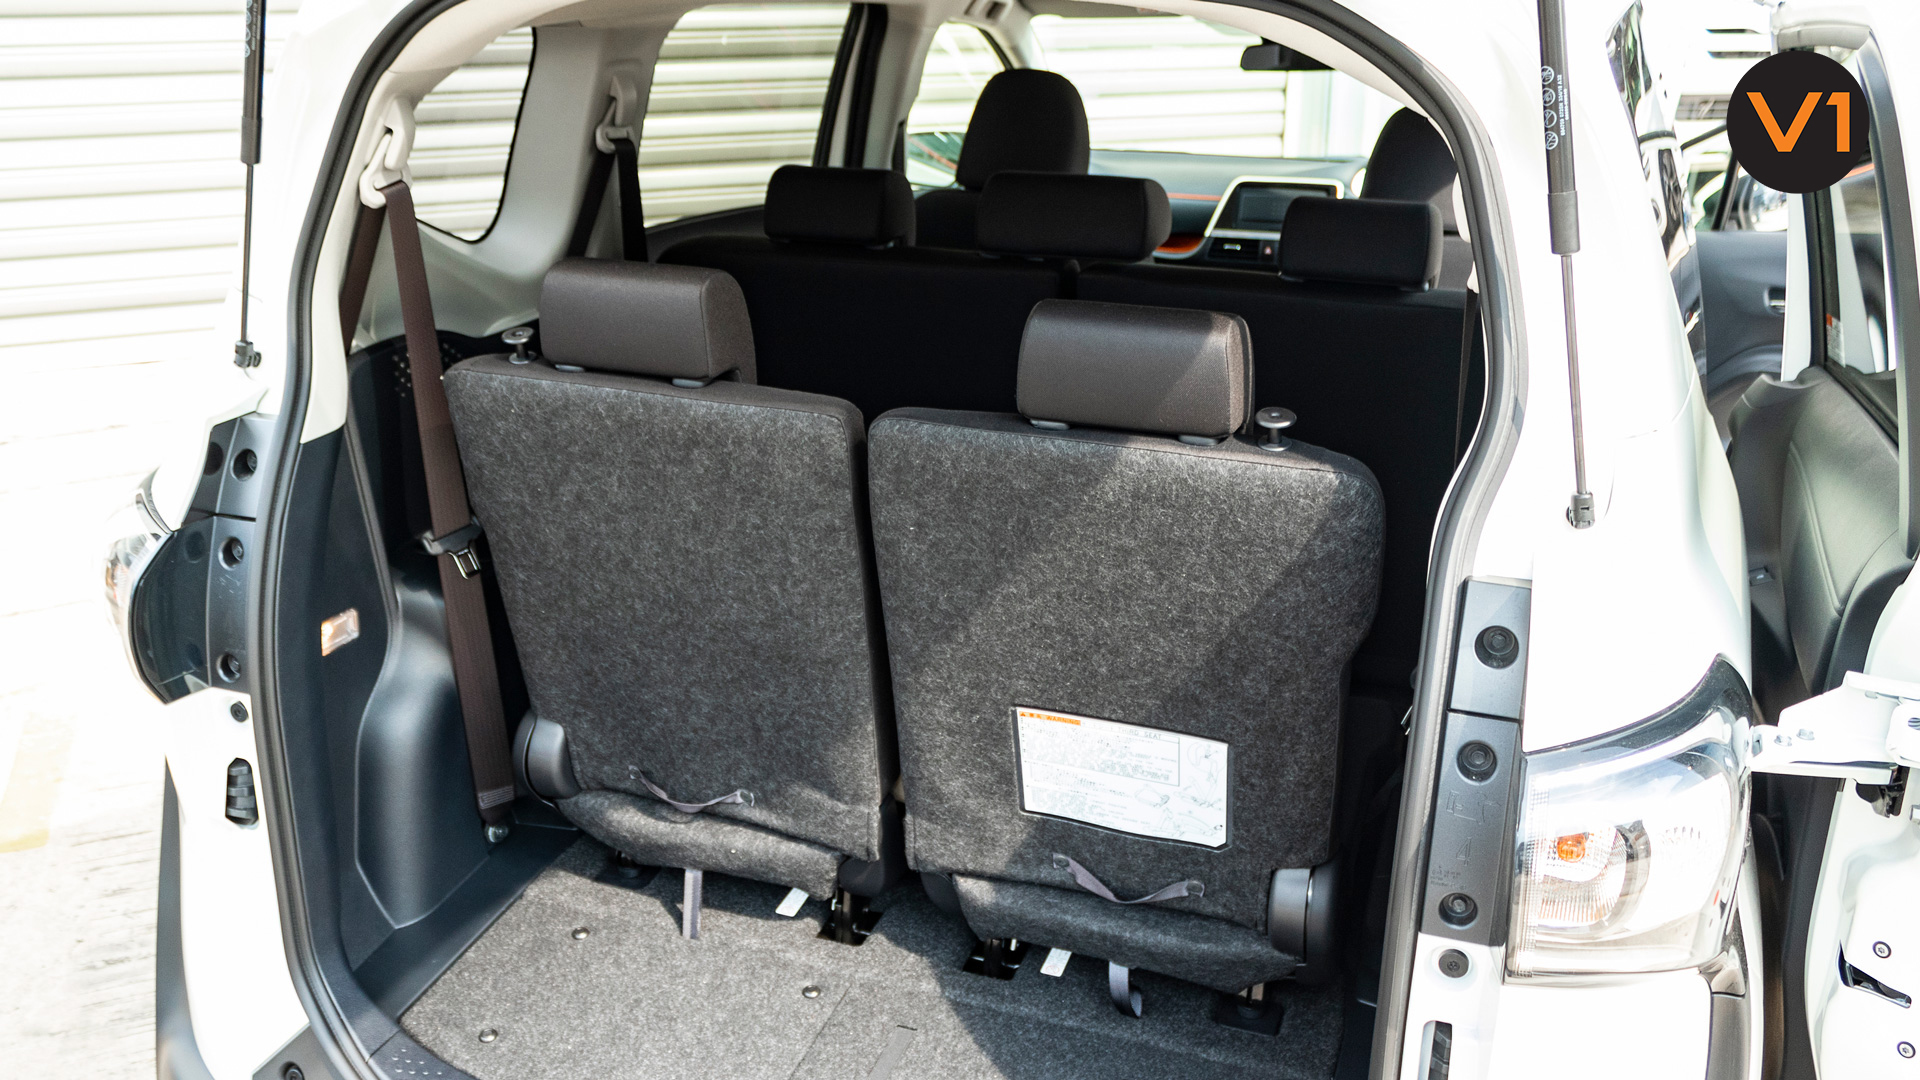 Toyota Sienta 1.5G Hybrid (New Facelift) - Rear Seat Trunk